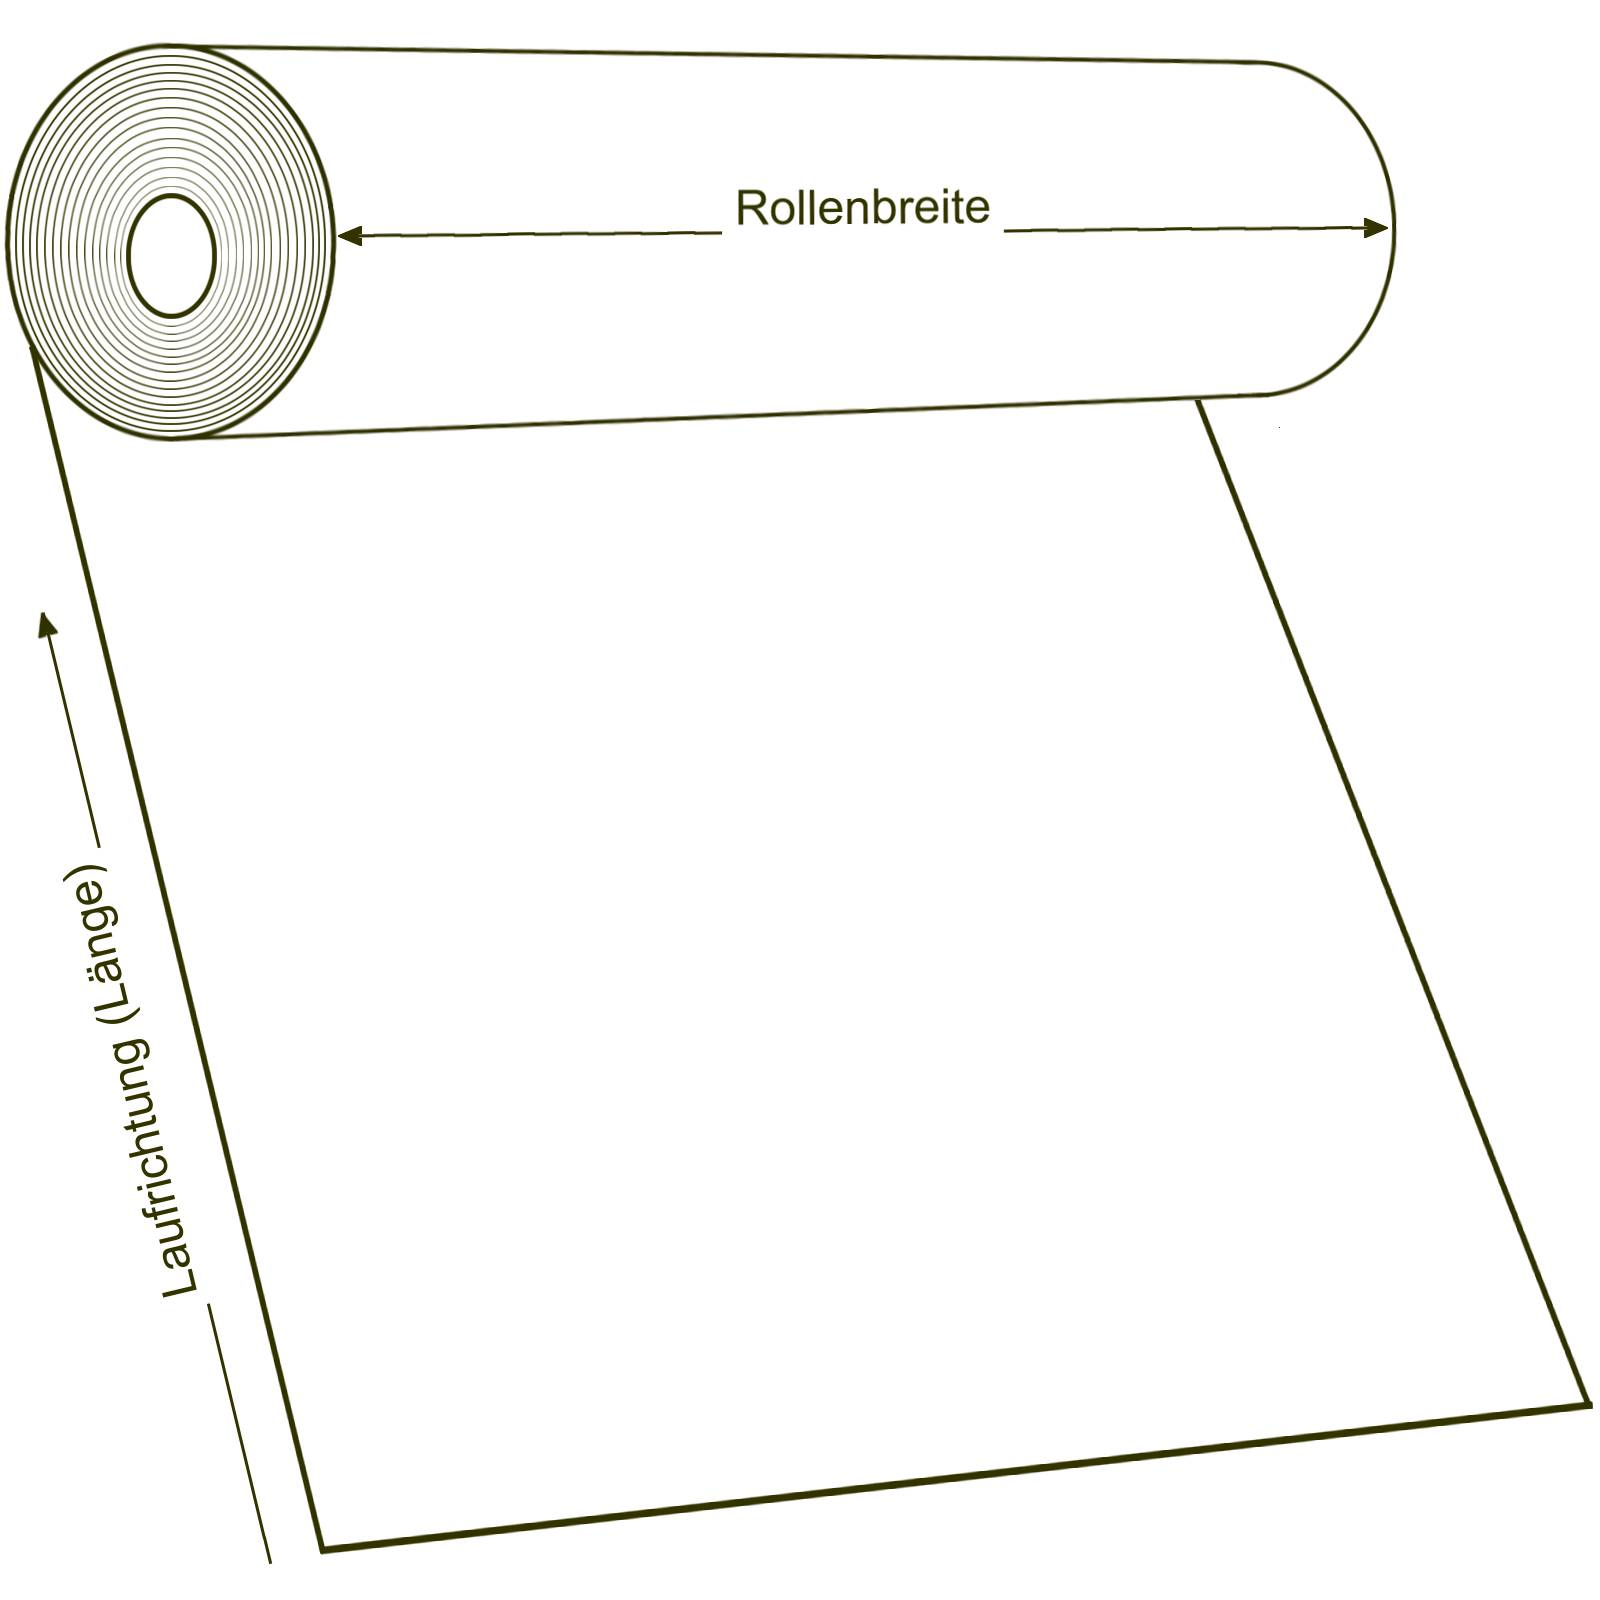 PVC Bodenbelag Einfarbig Uni Breite: 200 cm x L/änge: 250 cm, Schwarz 14,90 /€ p. m/²